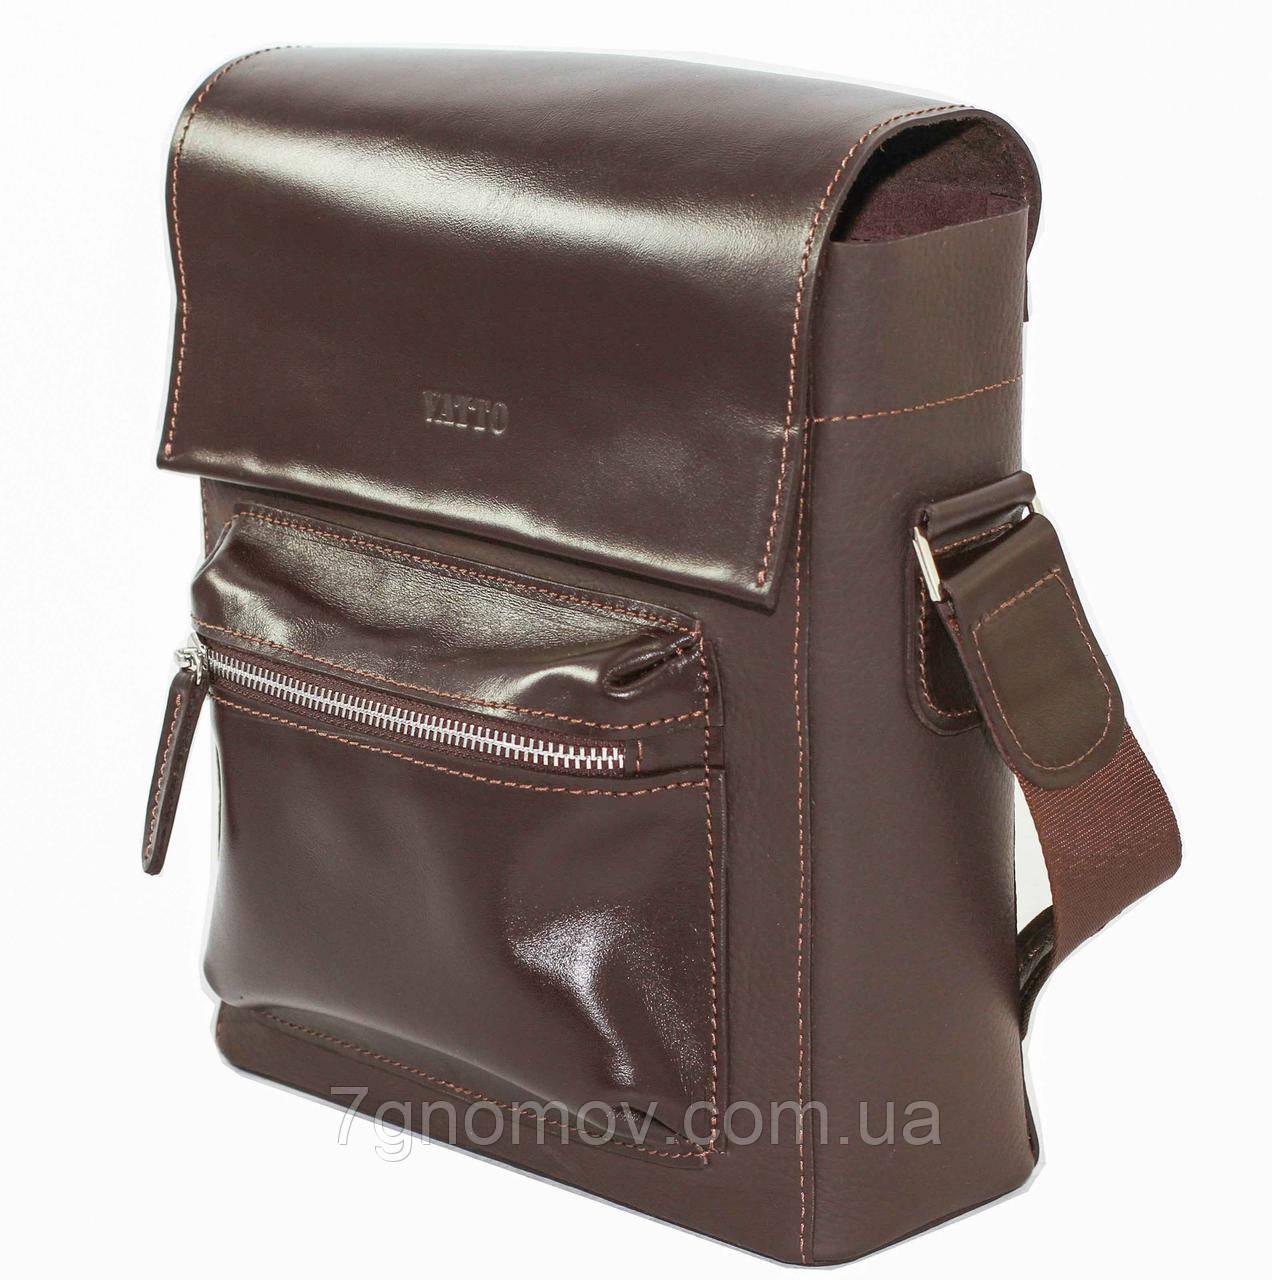 Мужская сумка VATTO Mk6.4 F7Kaz400